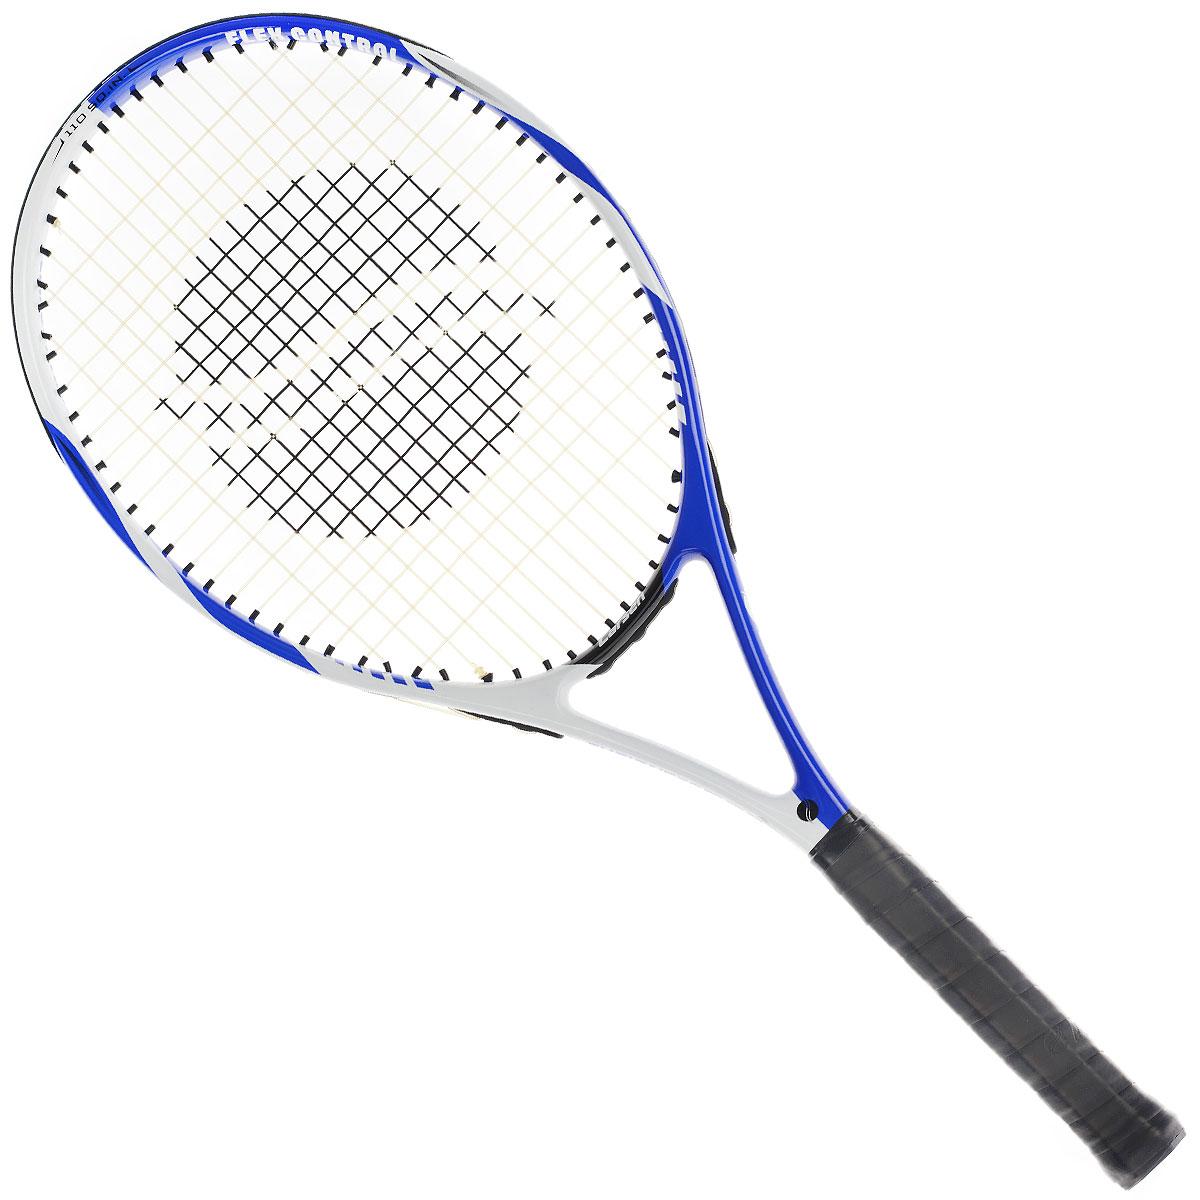 Ракетка для большого тенниса Larsen 577 цена